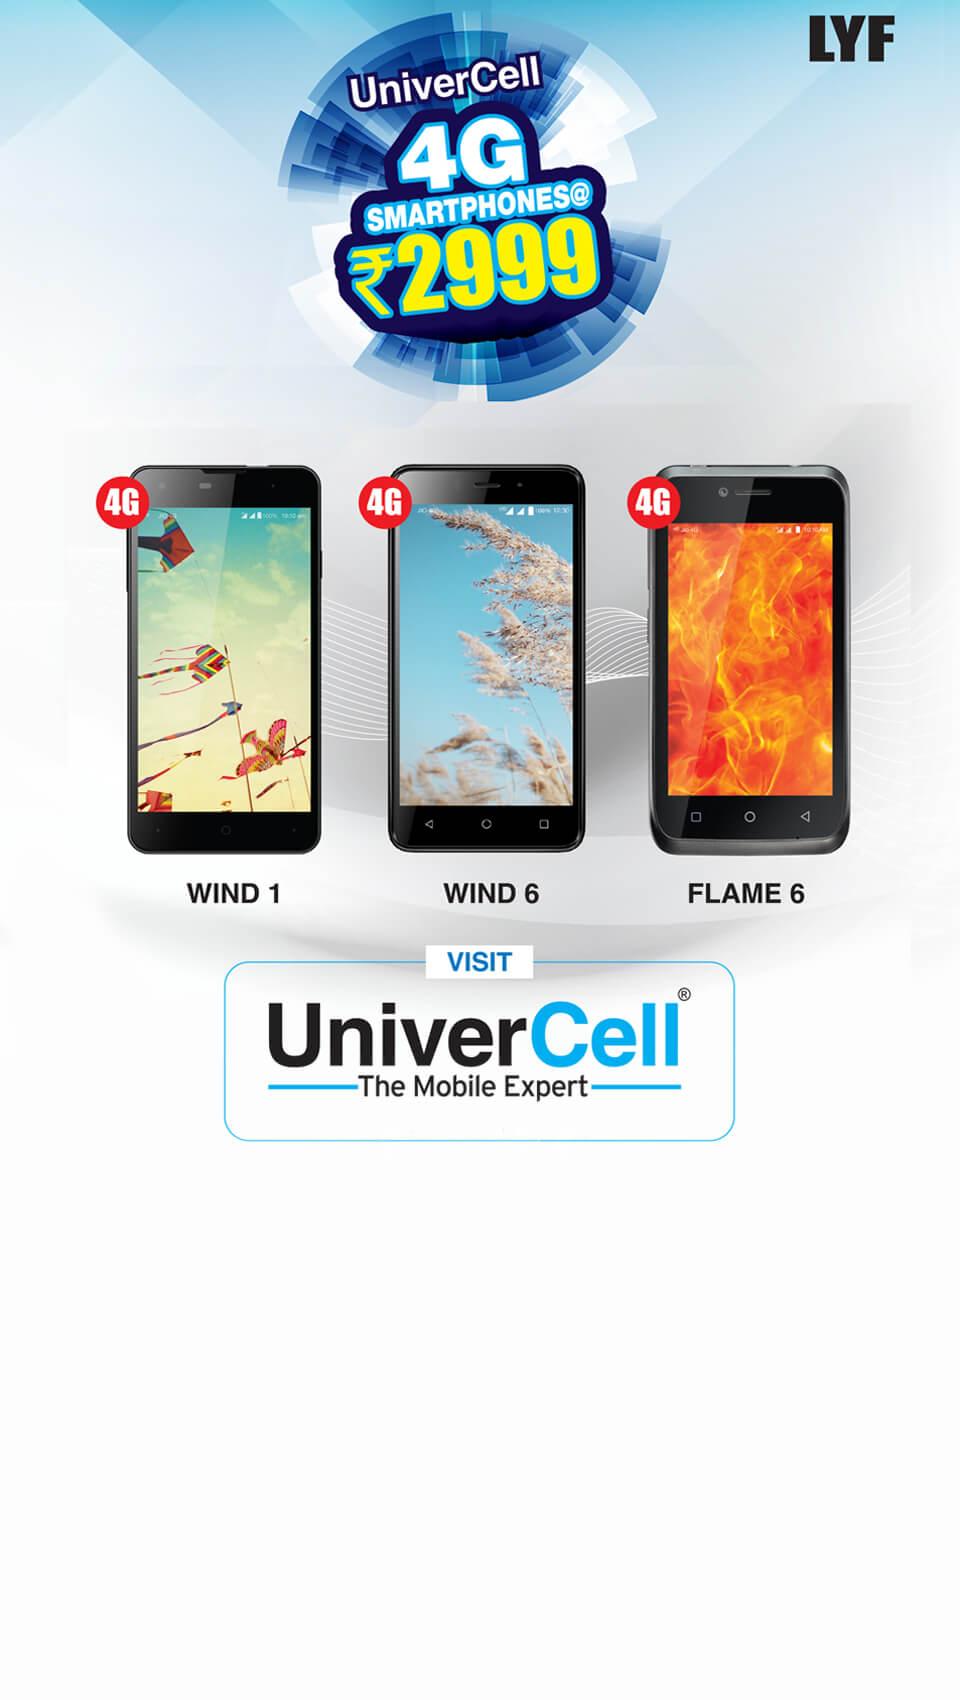 UNIVERCELL LYF - univercelllyf - buzztm -